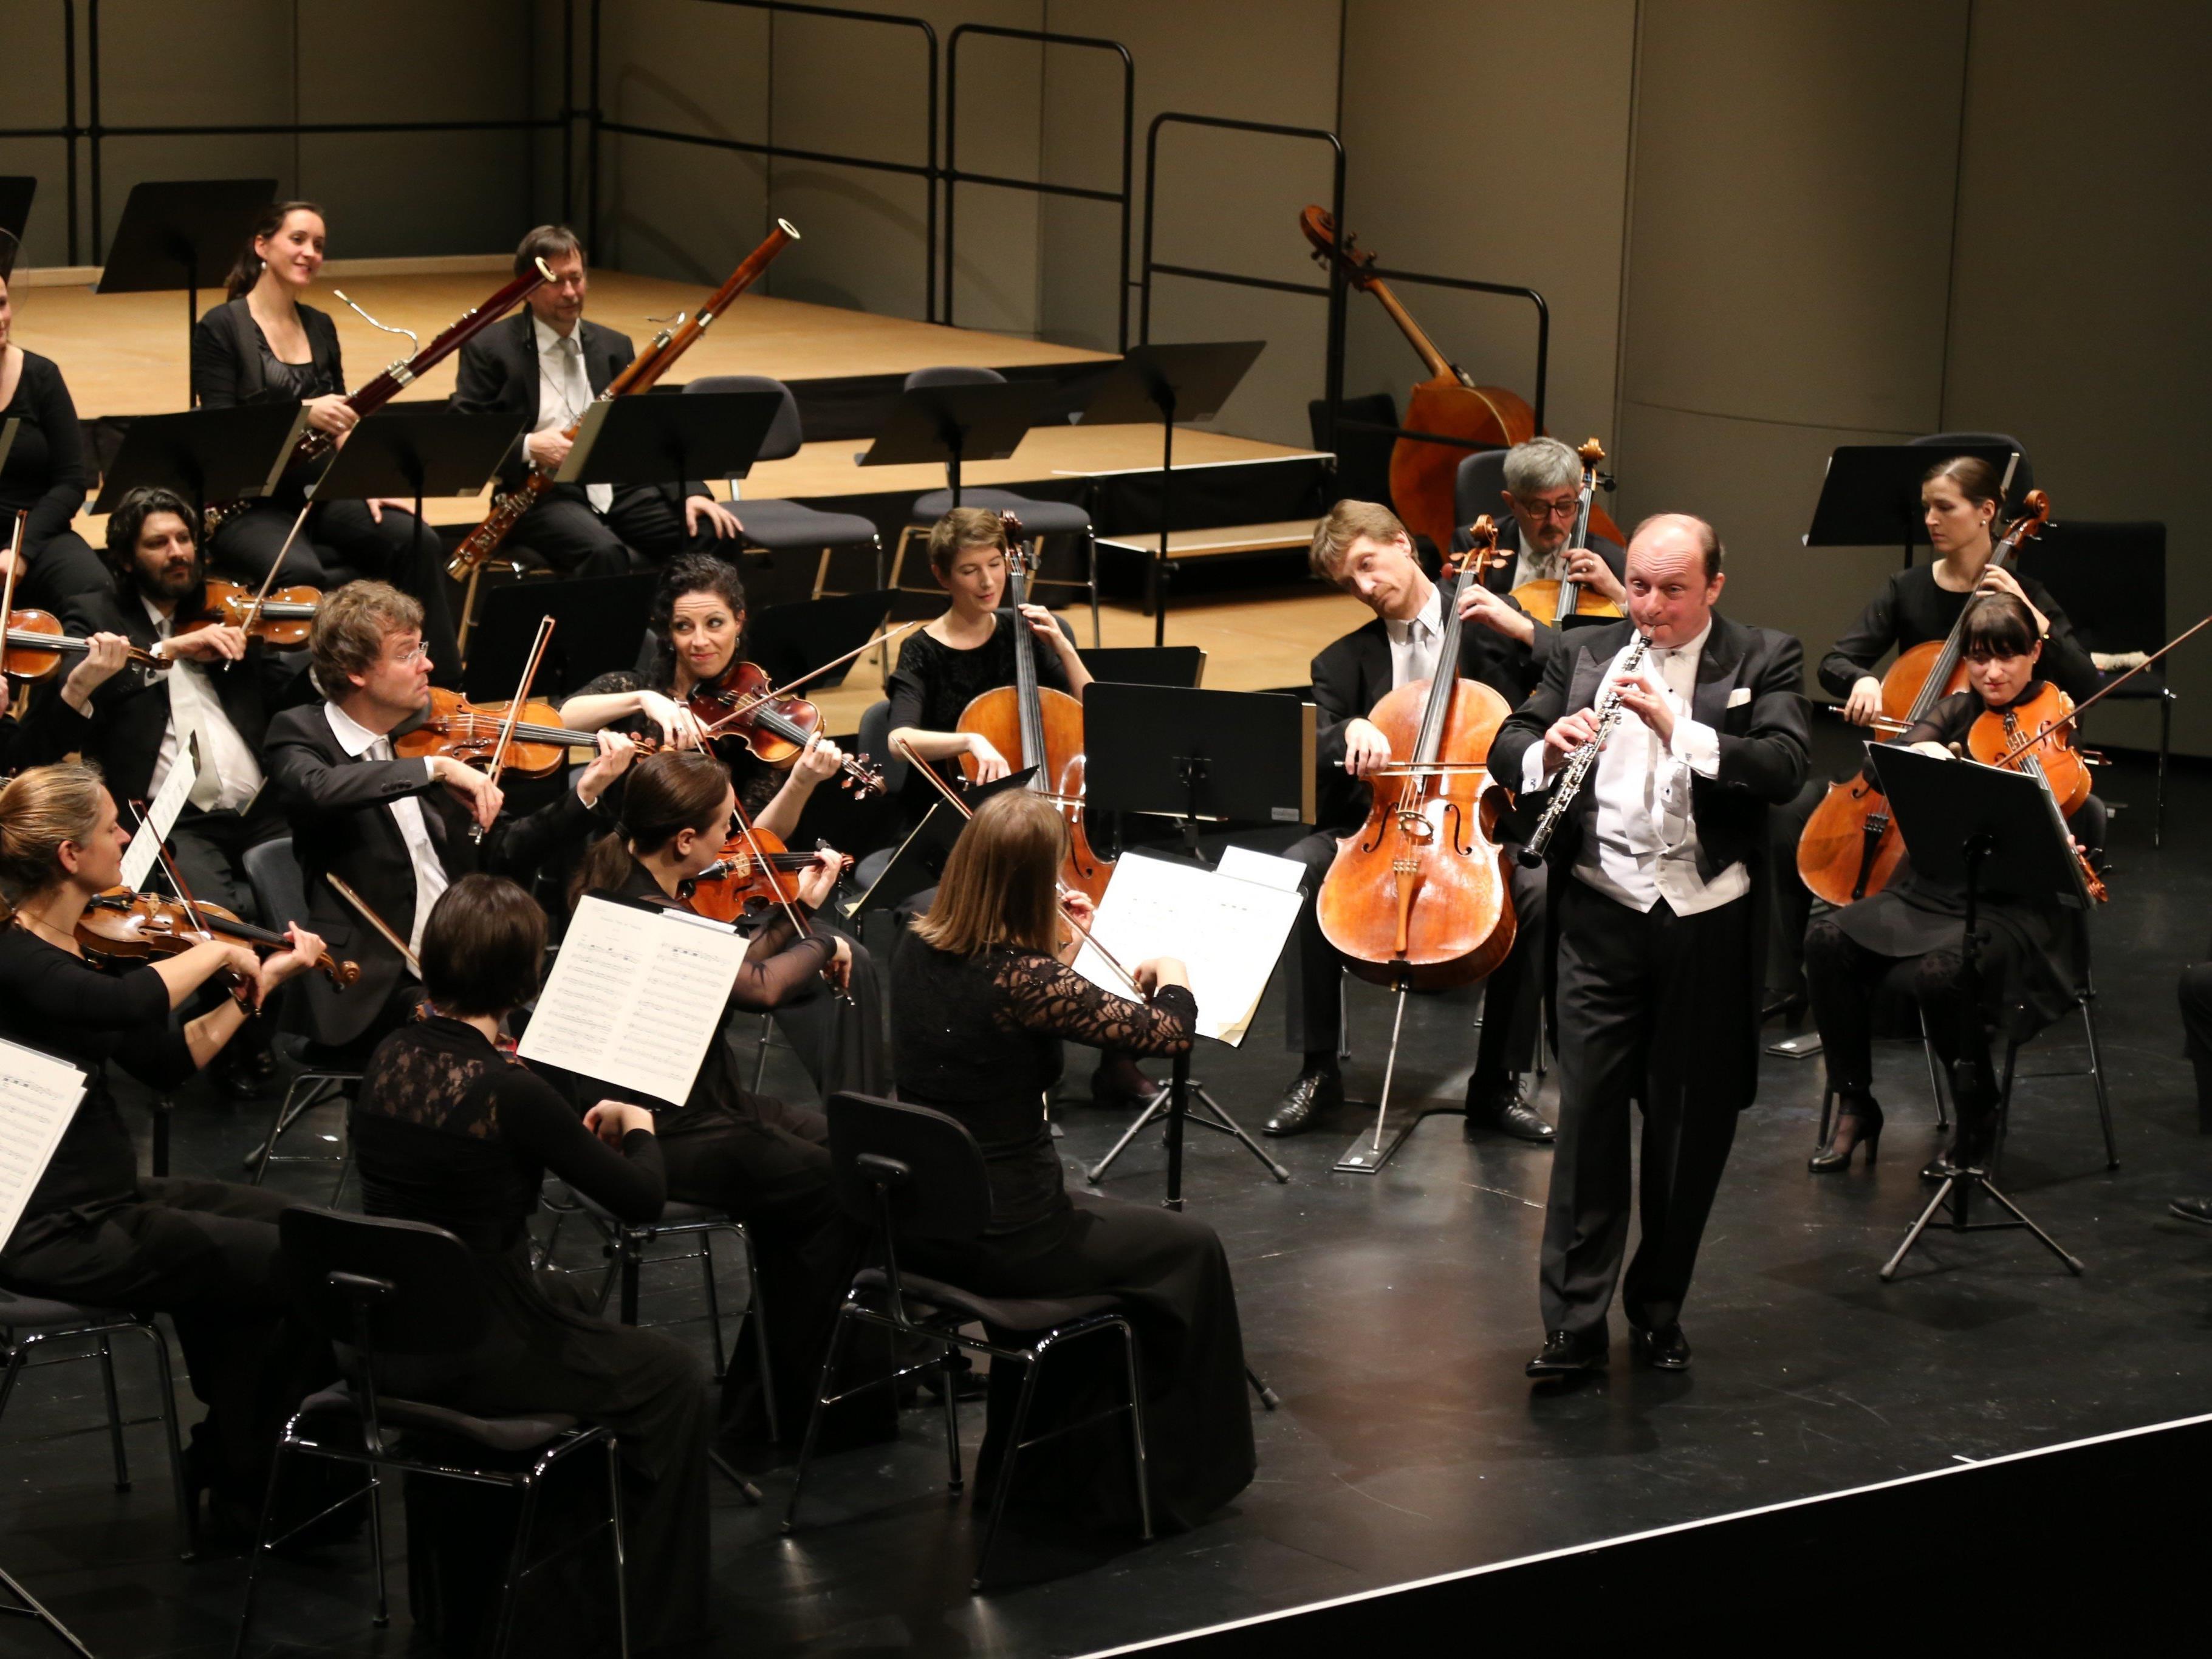 Maestro Leleux als weltberühmter Oboist.